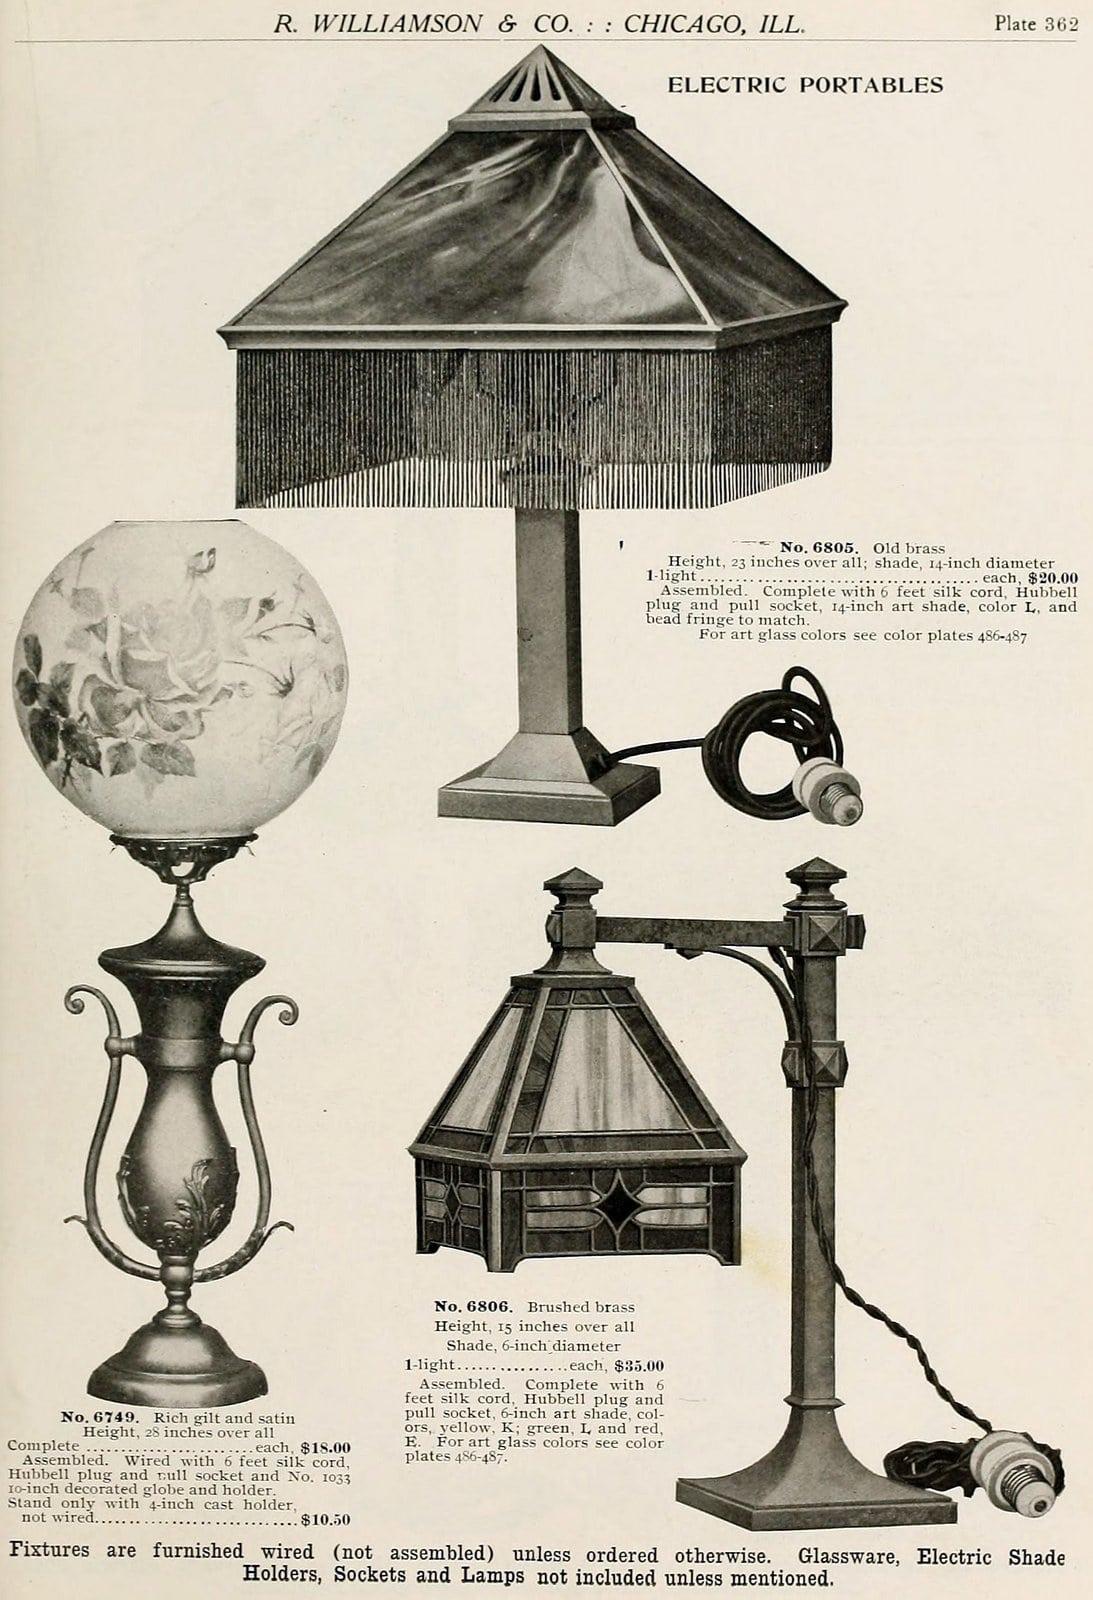 Antique lamp designs from around 1910 (2)